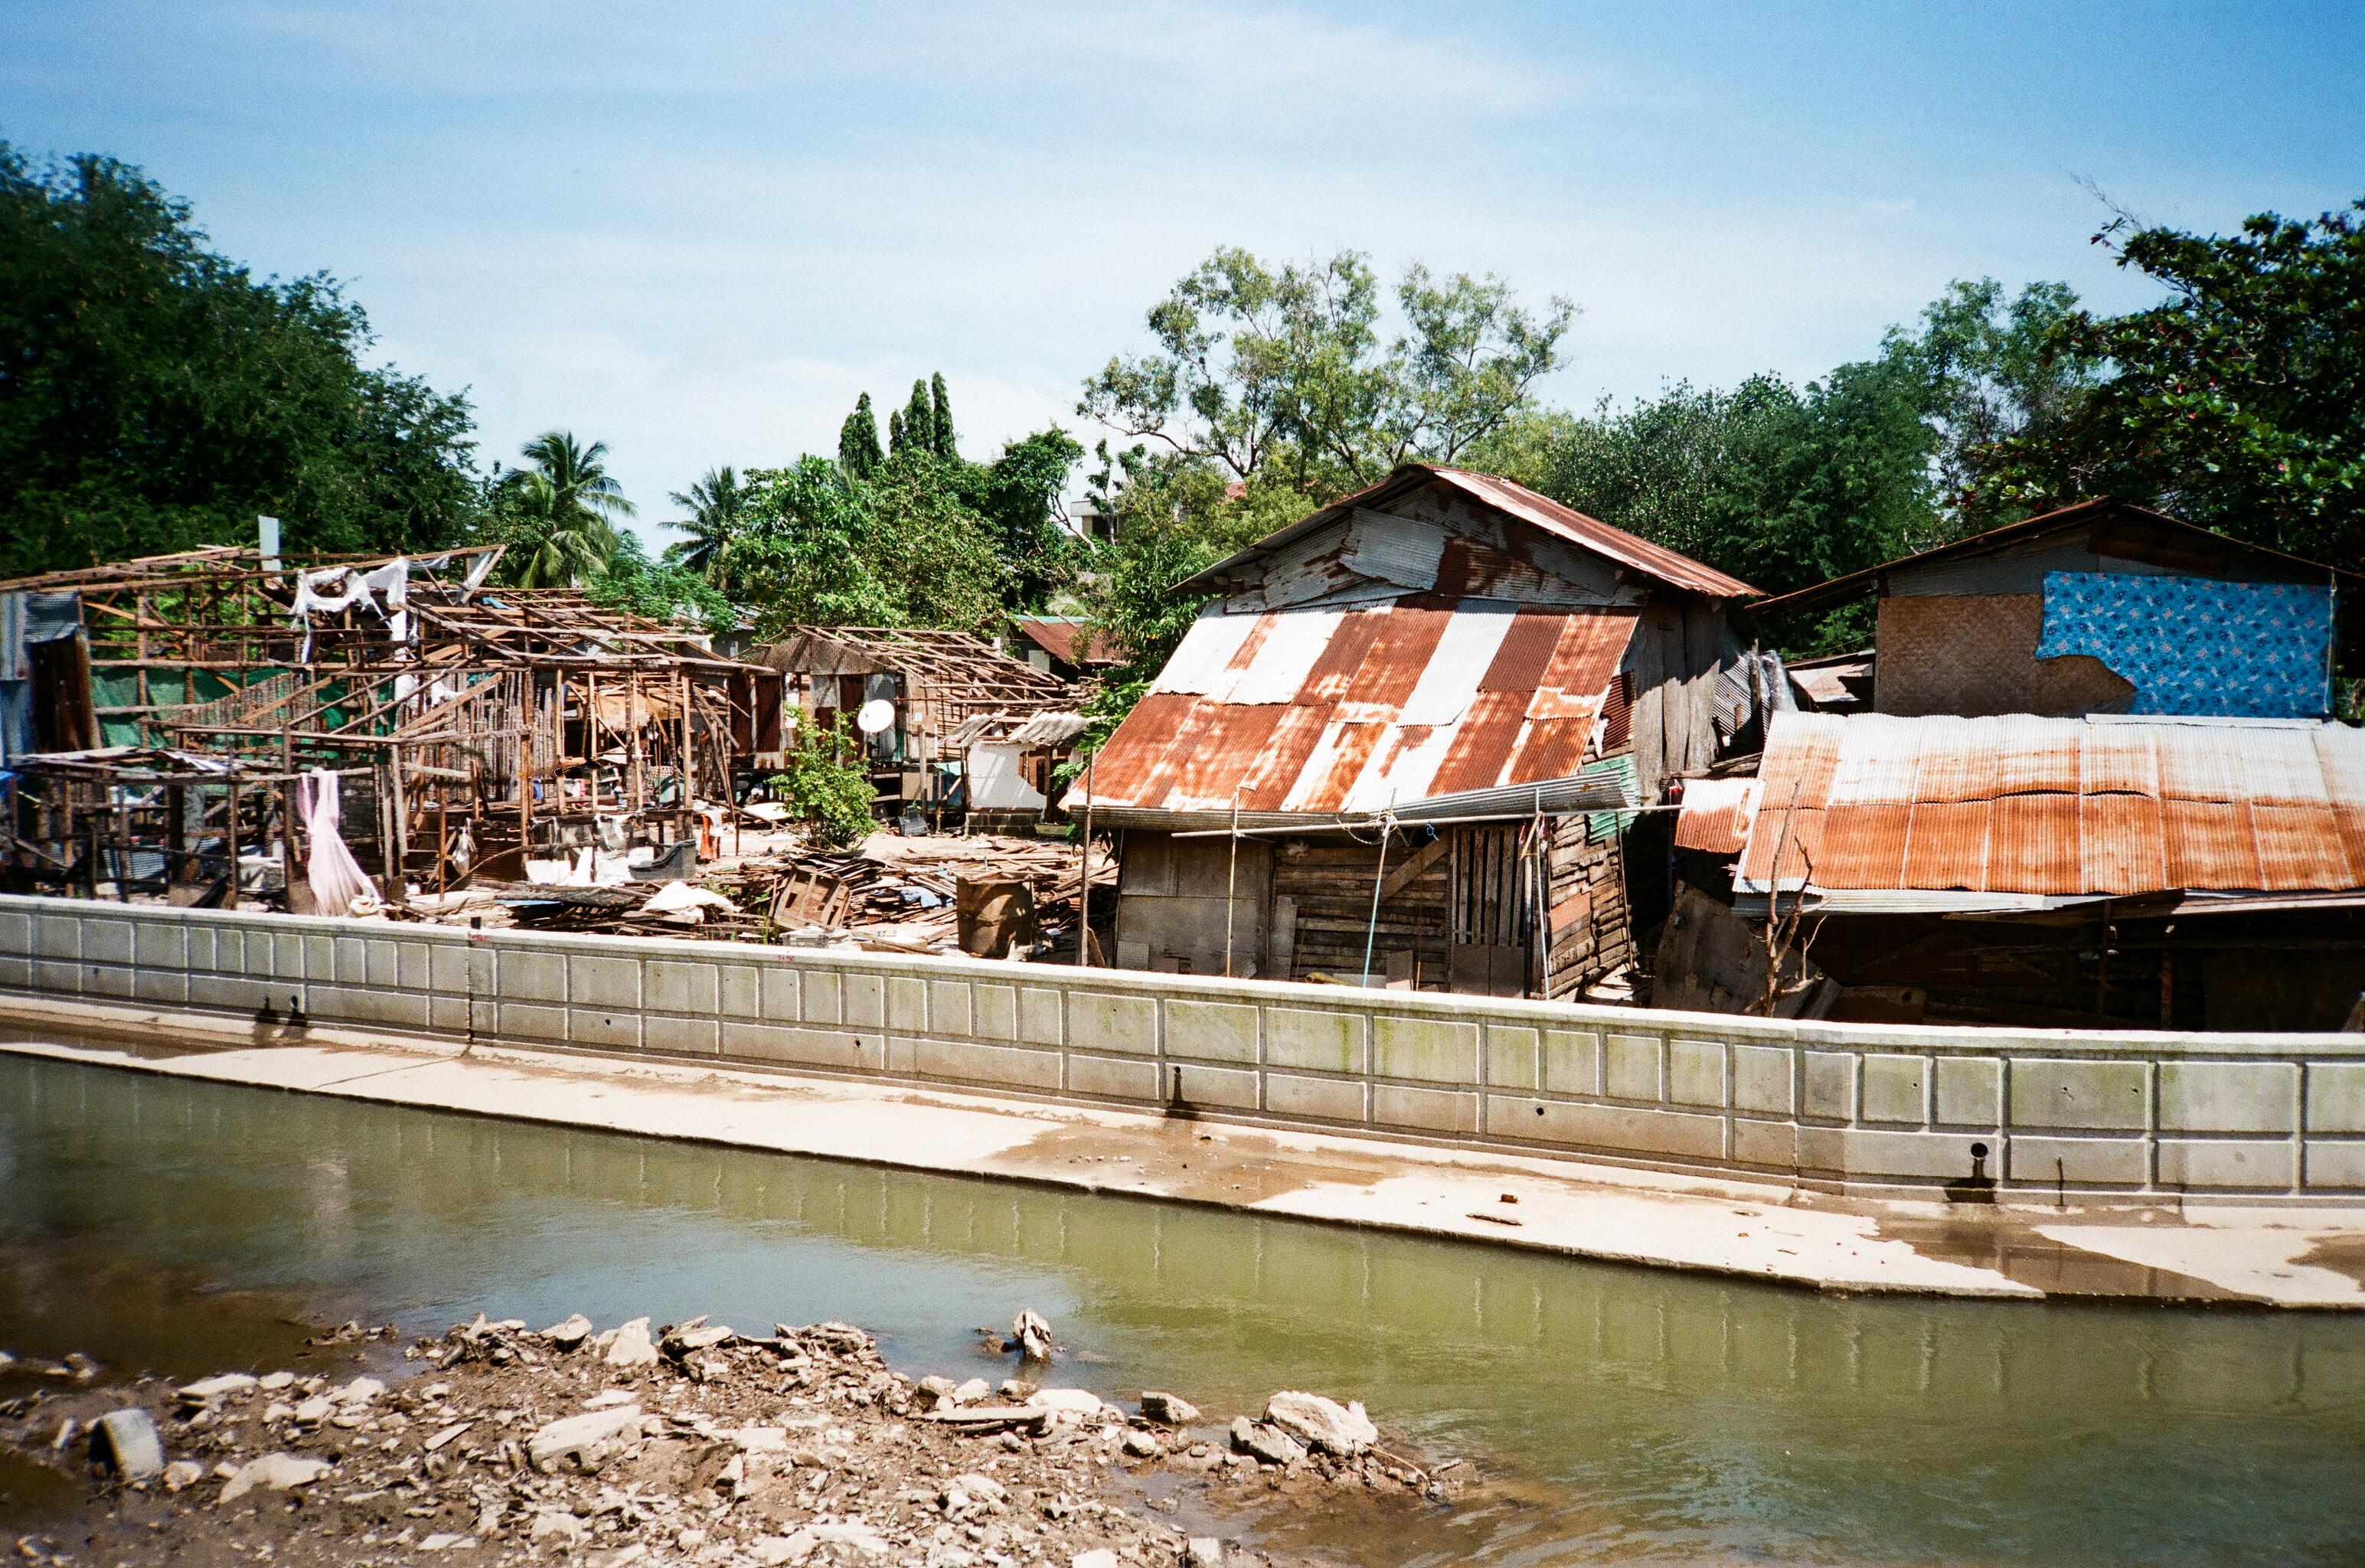 Southern Koh Samui – Olympus XA